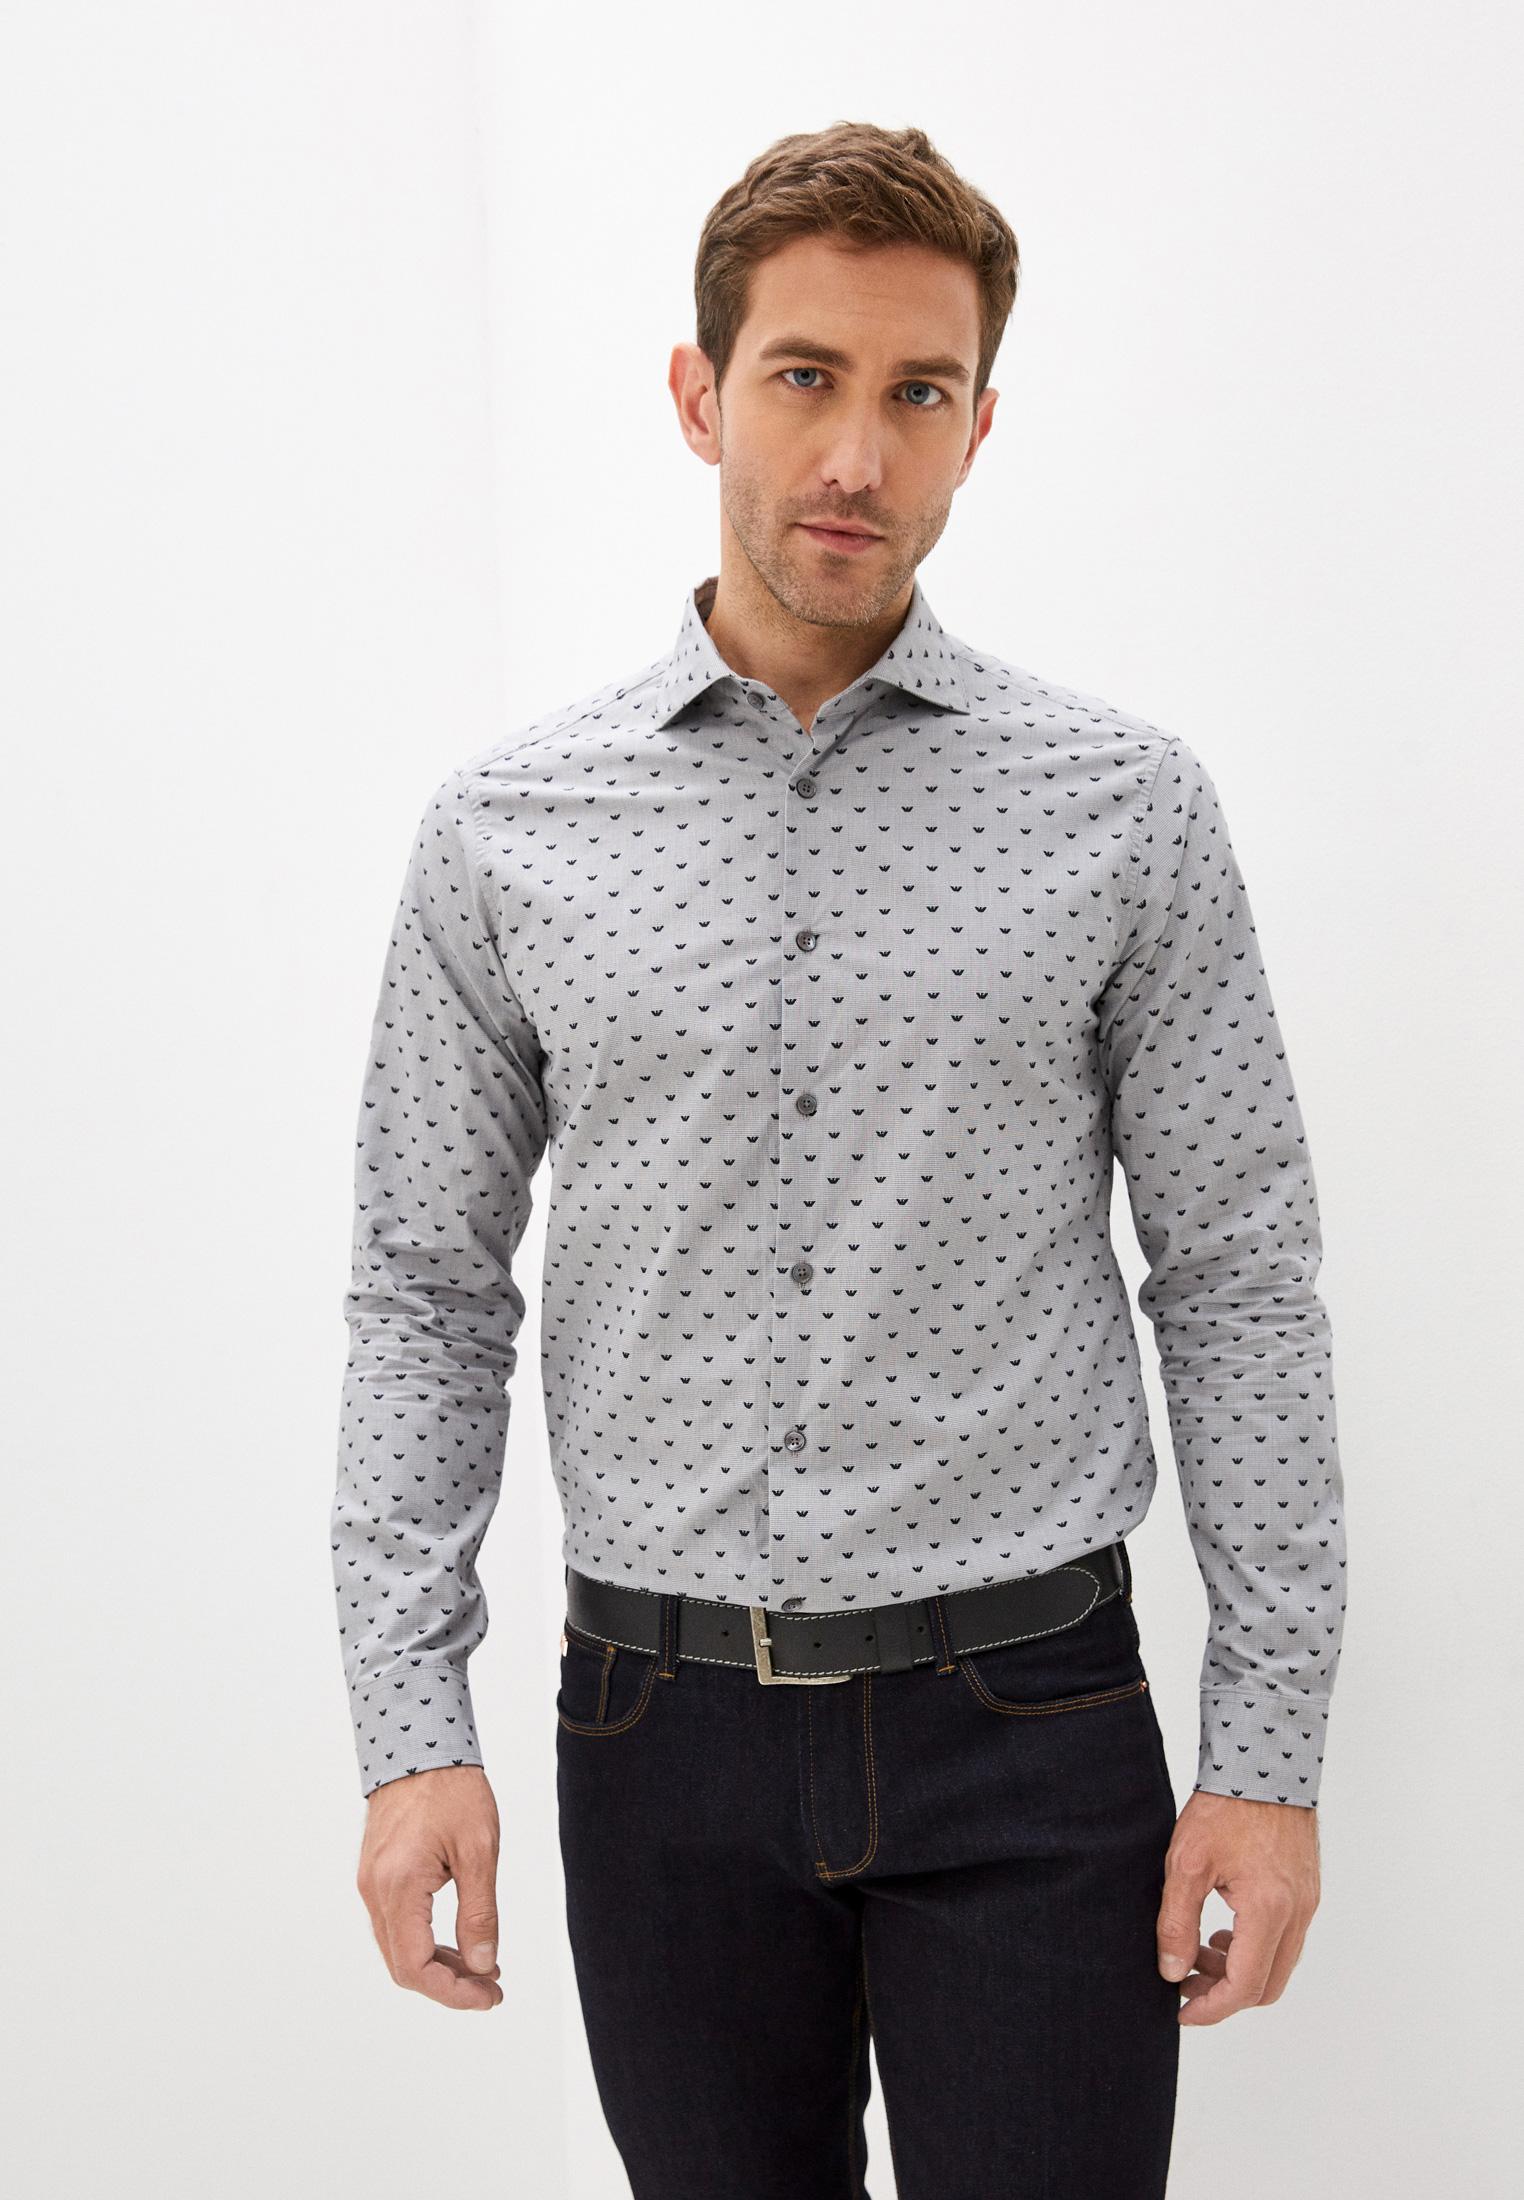 Рубашка с длинным рукавом Emporio Armani (Эмпорио Армани) 6K1CD4 1NZRZ